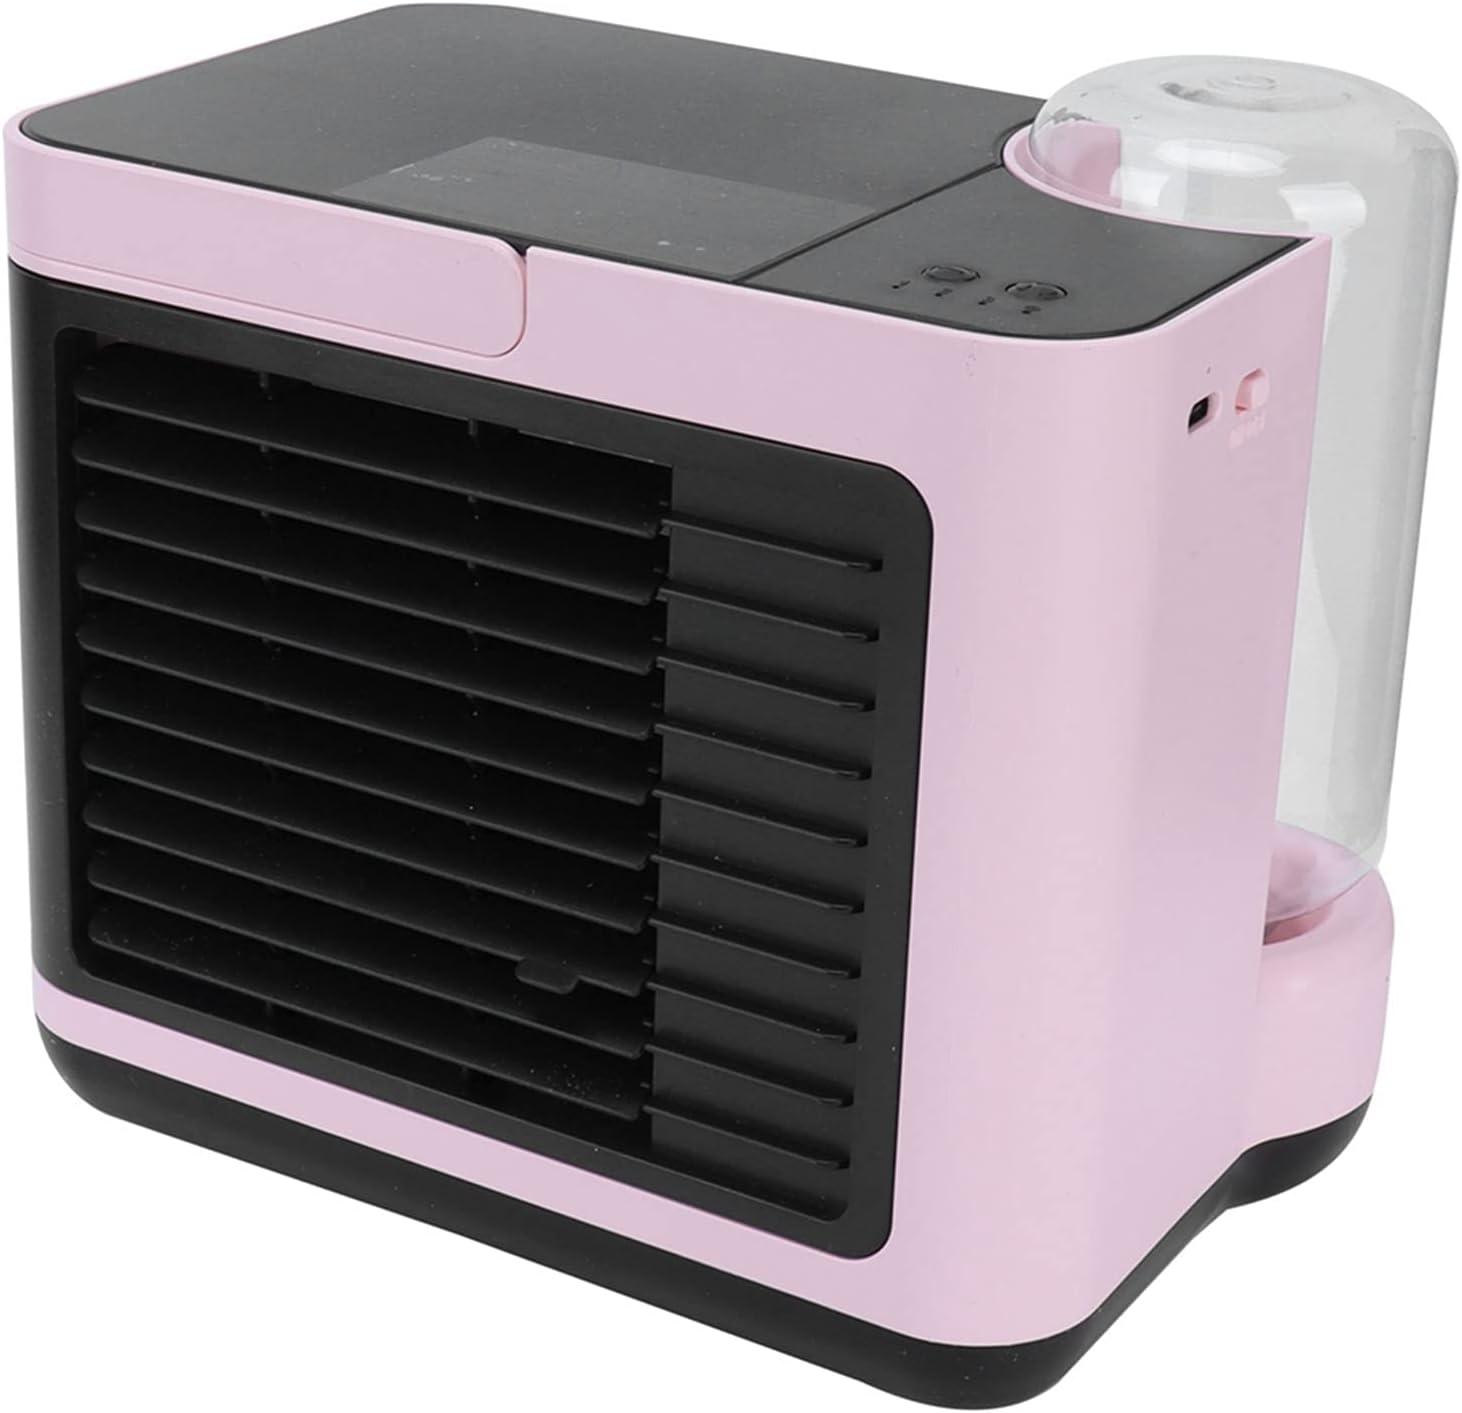 Mini Attention brand USB Max 59% OFF Desk Fan Negative Adjustable Ion P Air Conditioner